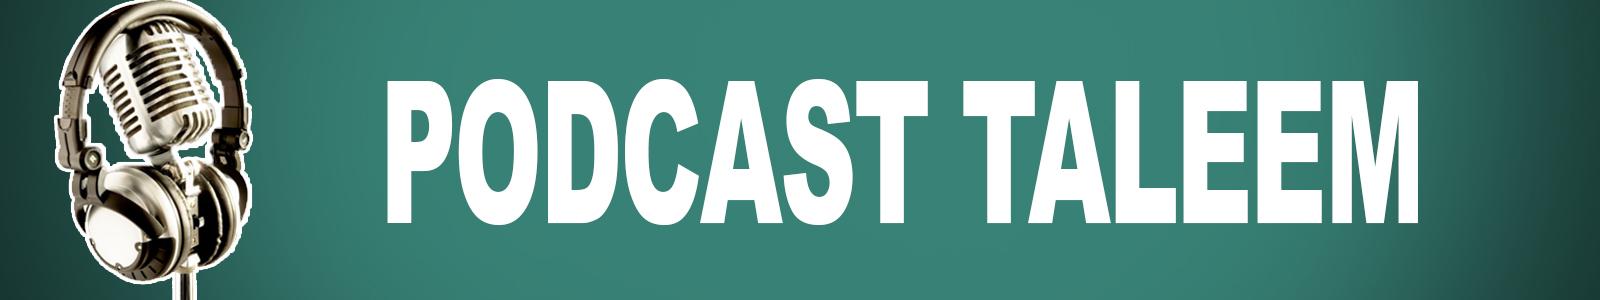 podcast-taleem